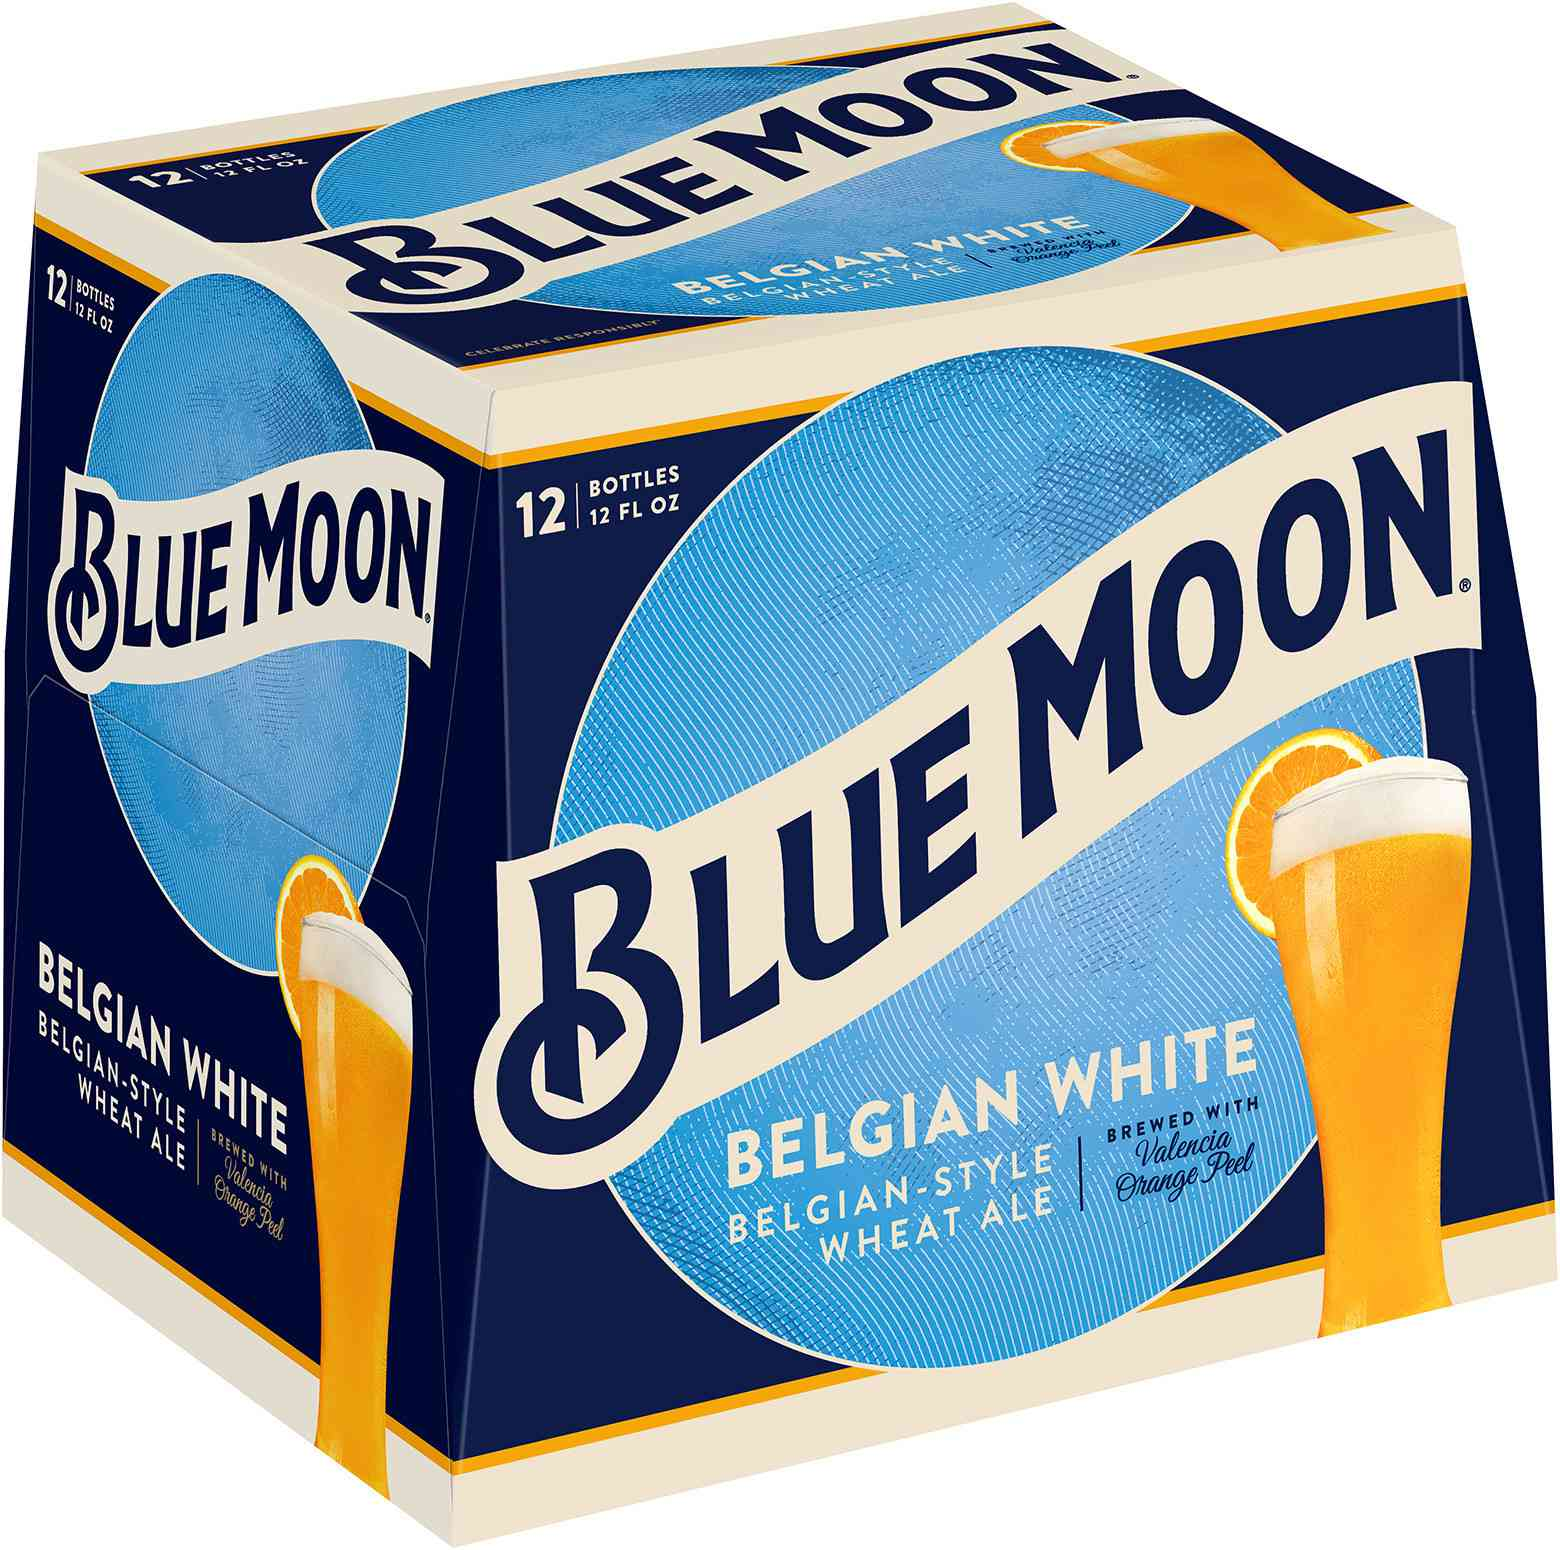 Blue Moon Belgian White Wheat Craft Beer